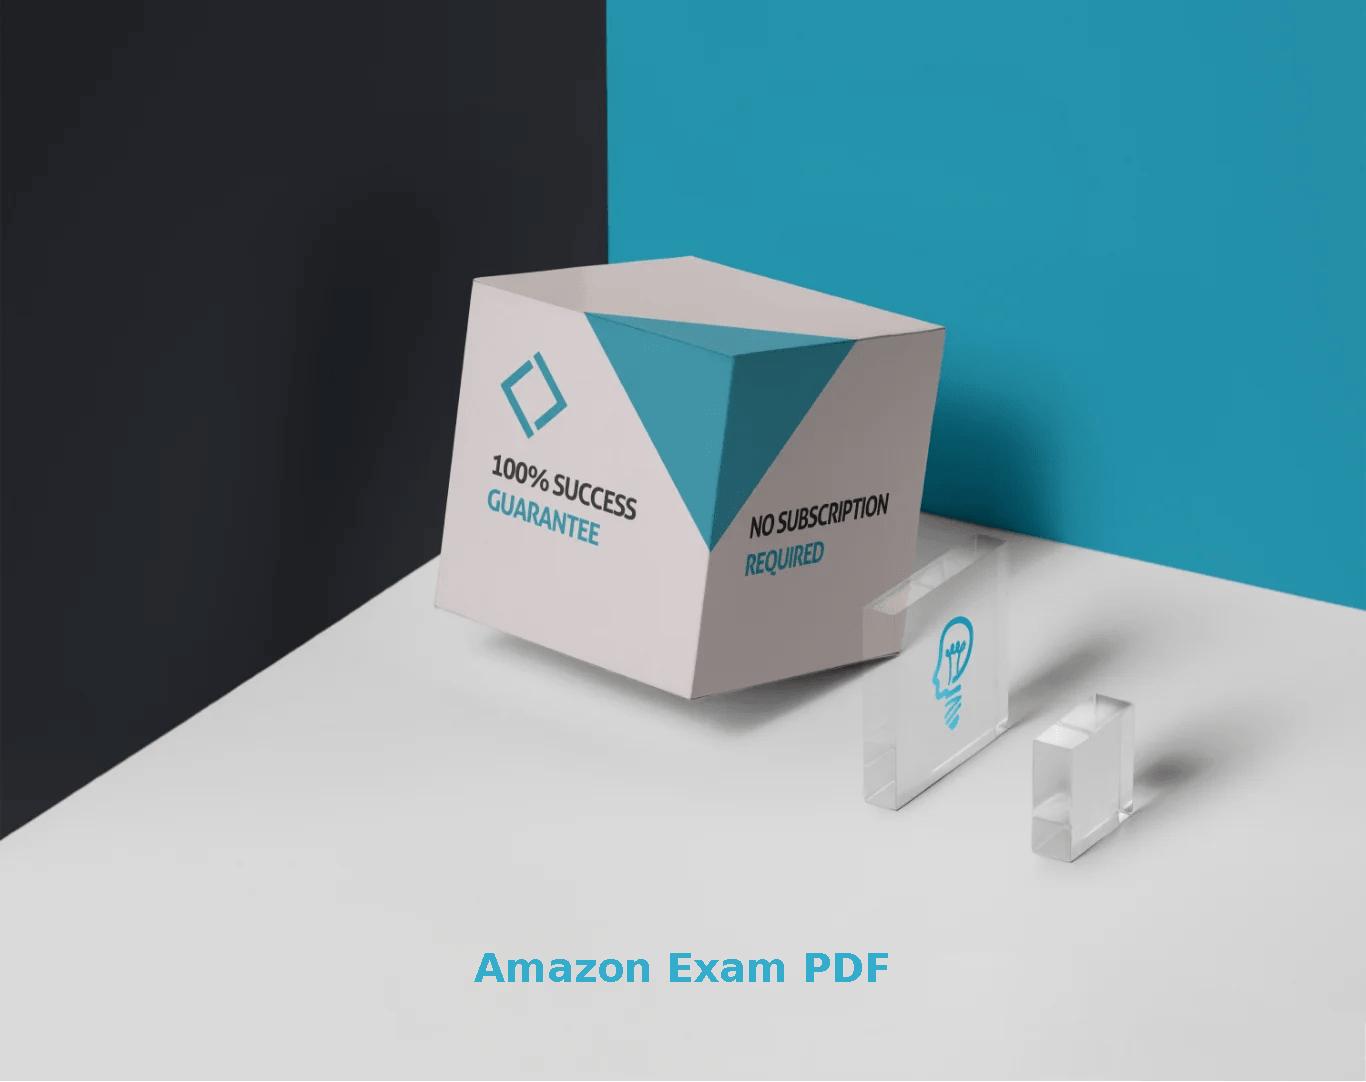 Amazon Exam PDF